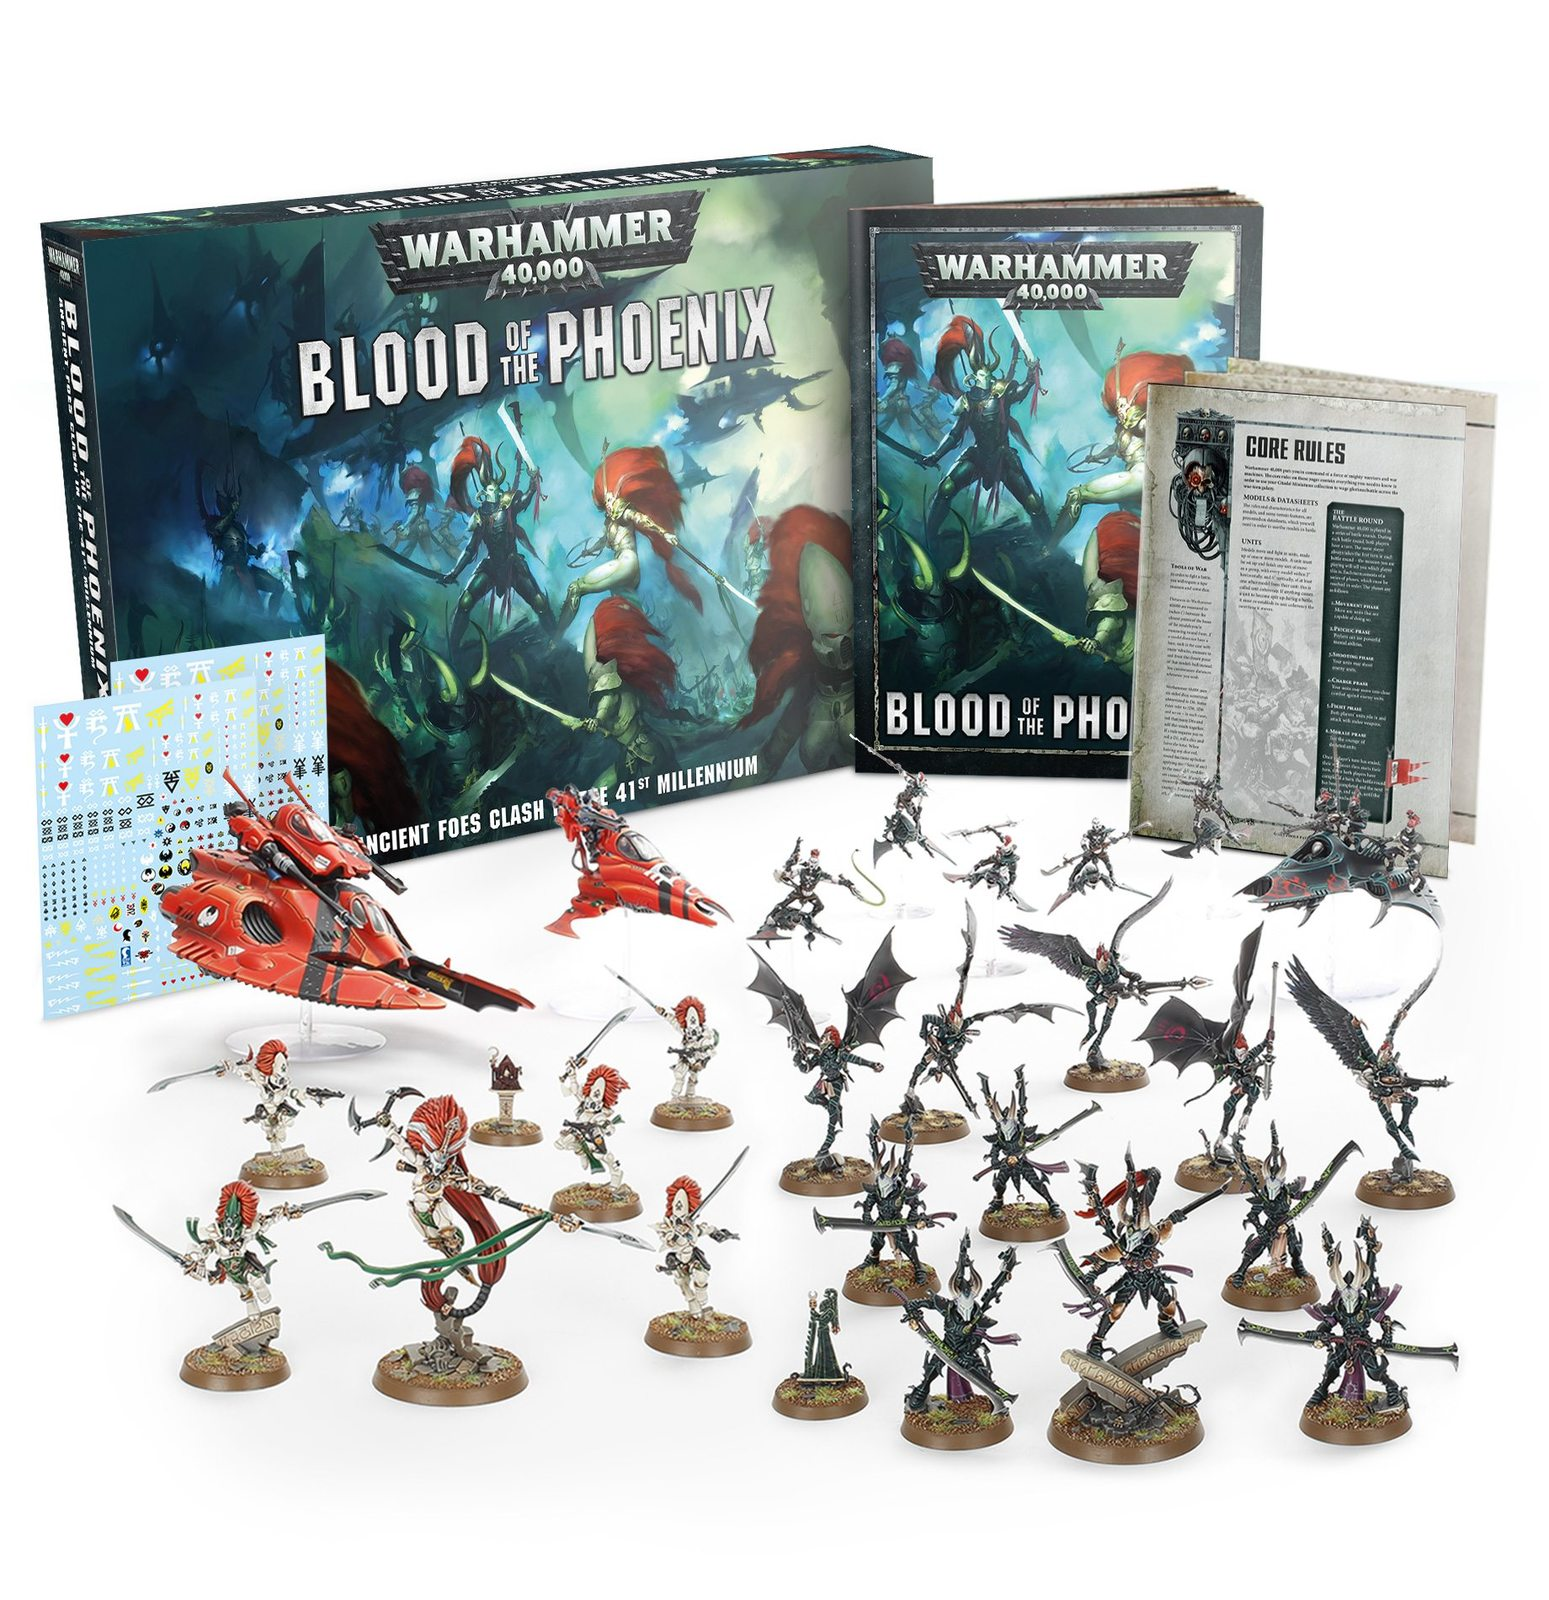 Warhammer 40,000: Blood of the Phoenix image